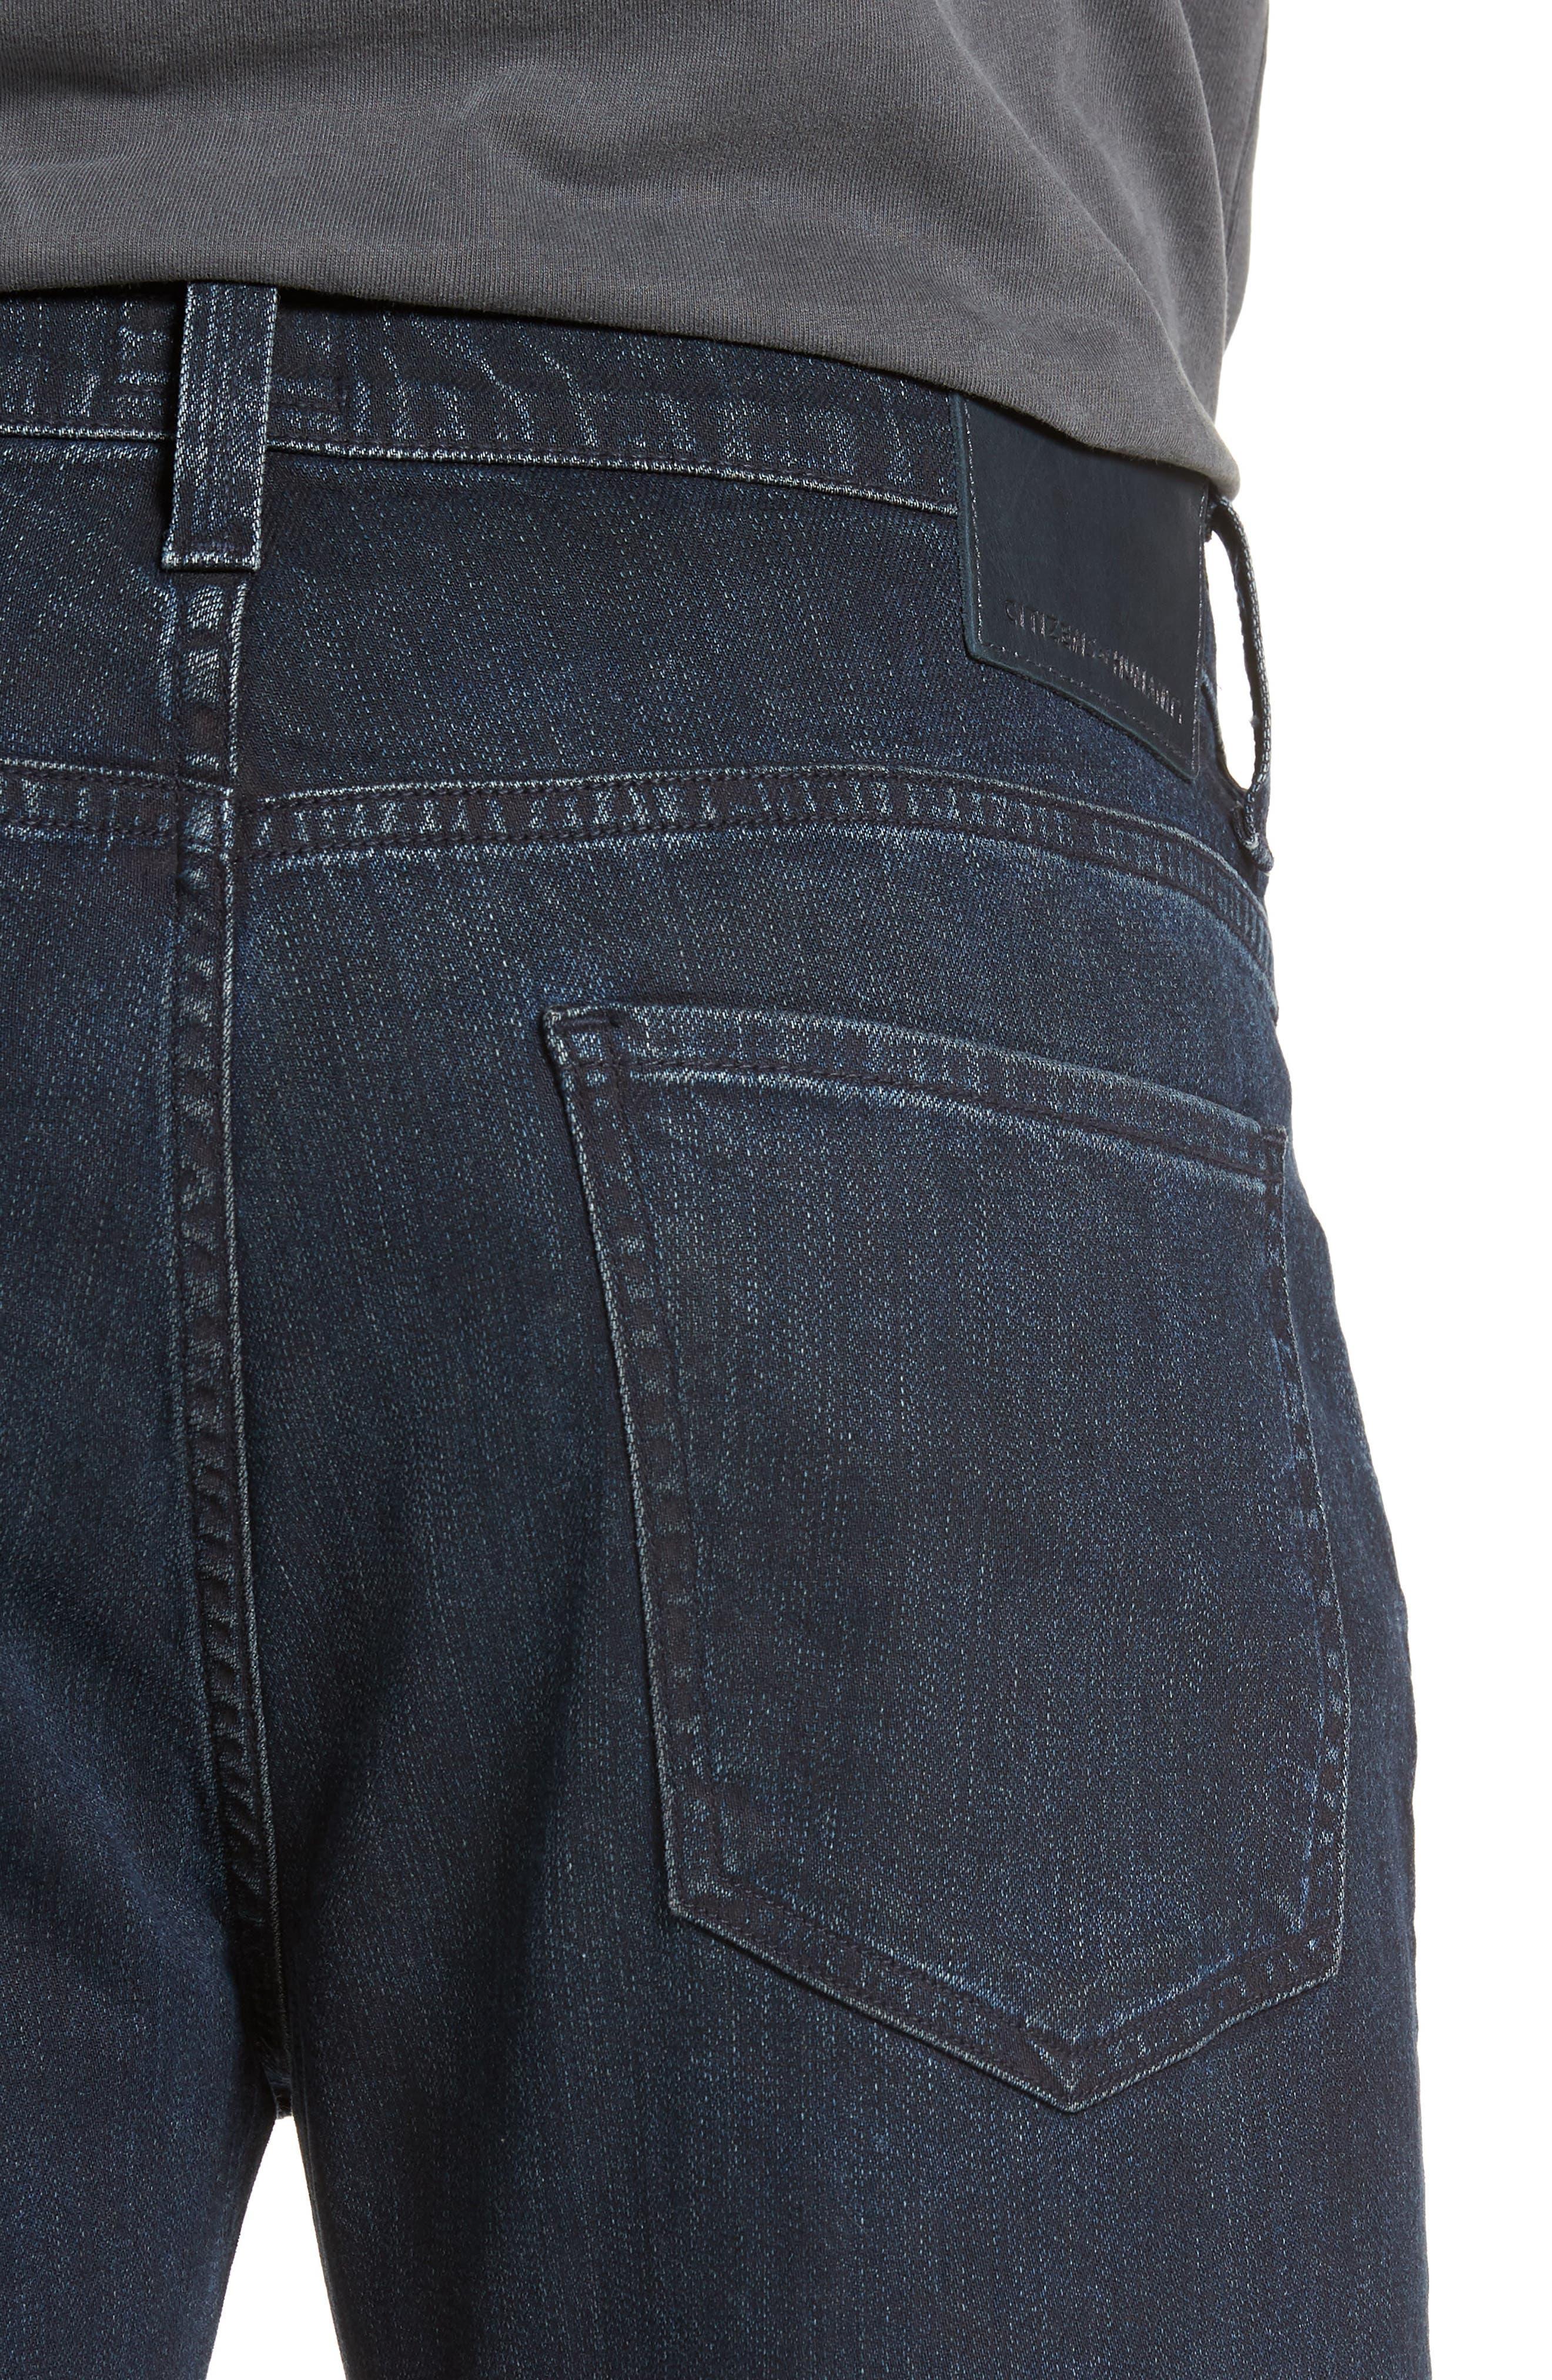 Sid Straight Leg Jeans,                             Alternate thumbnail 4, color,                             410